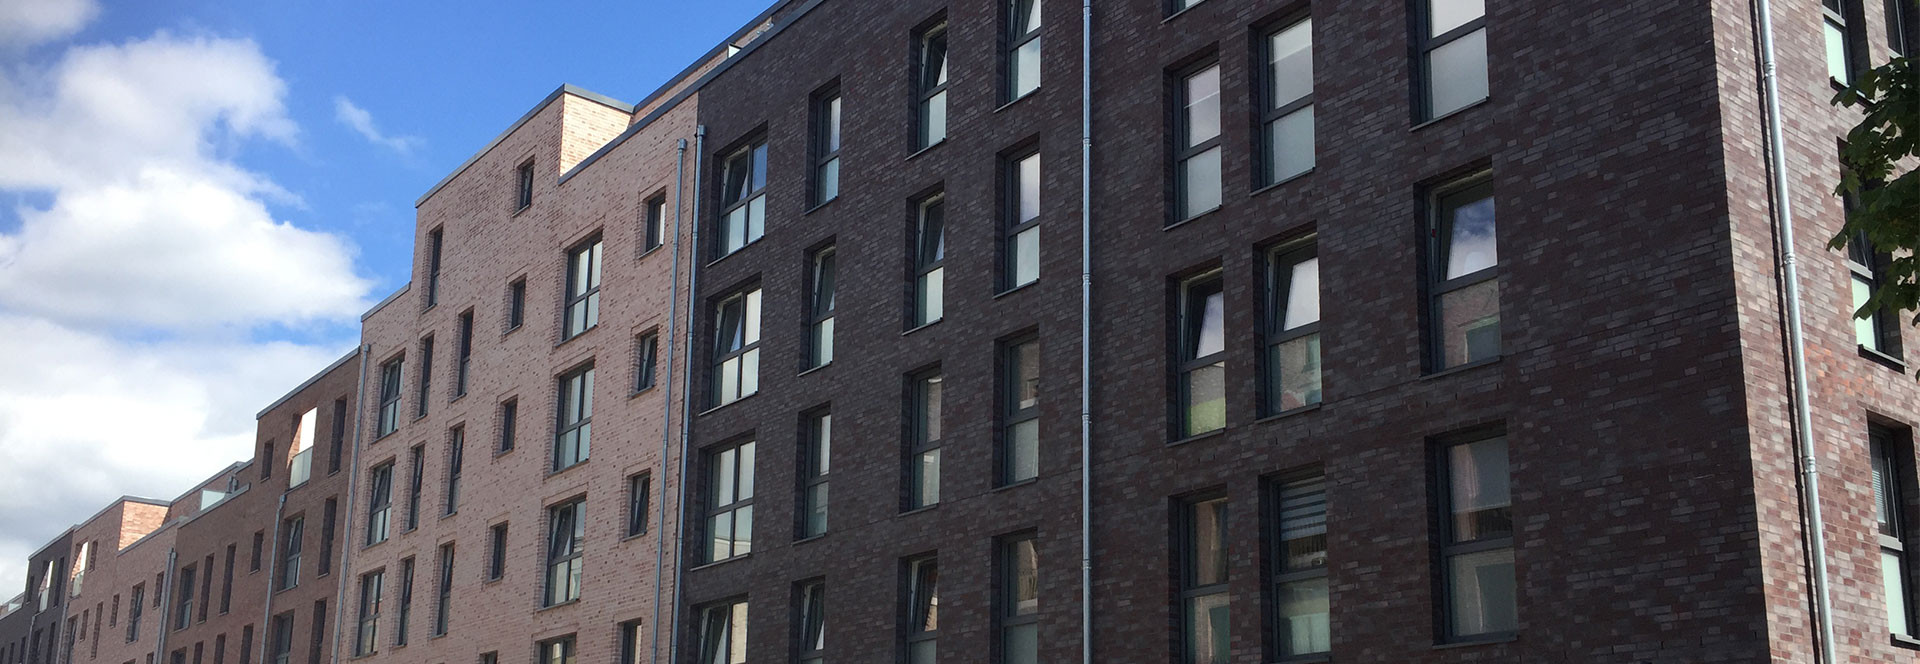 "Saga Wohnungen Hamburg  104 SAGA Wohnungen ""Finkenau 31"" Hamburg MEA Group"